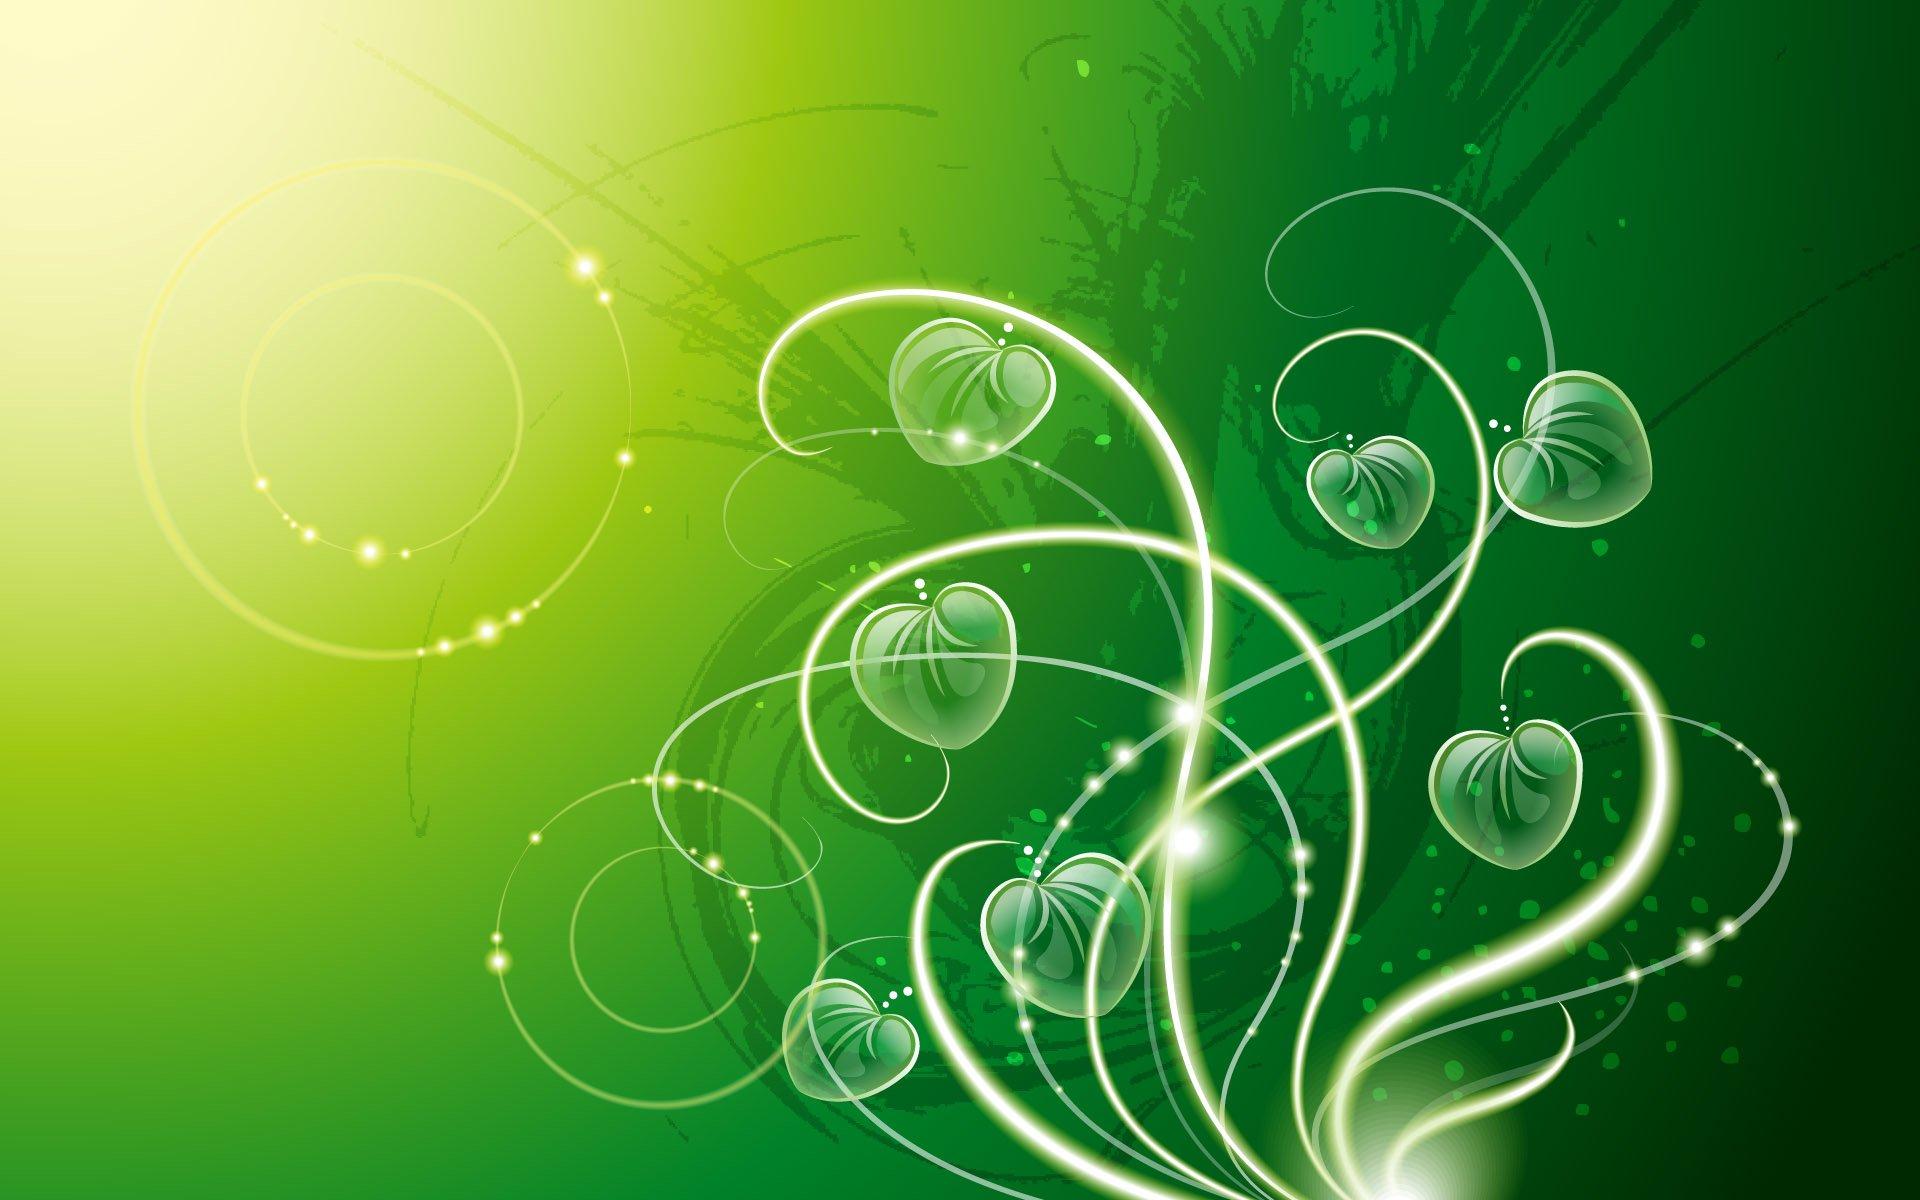 Artistic - Artistic  Green Wallpaper